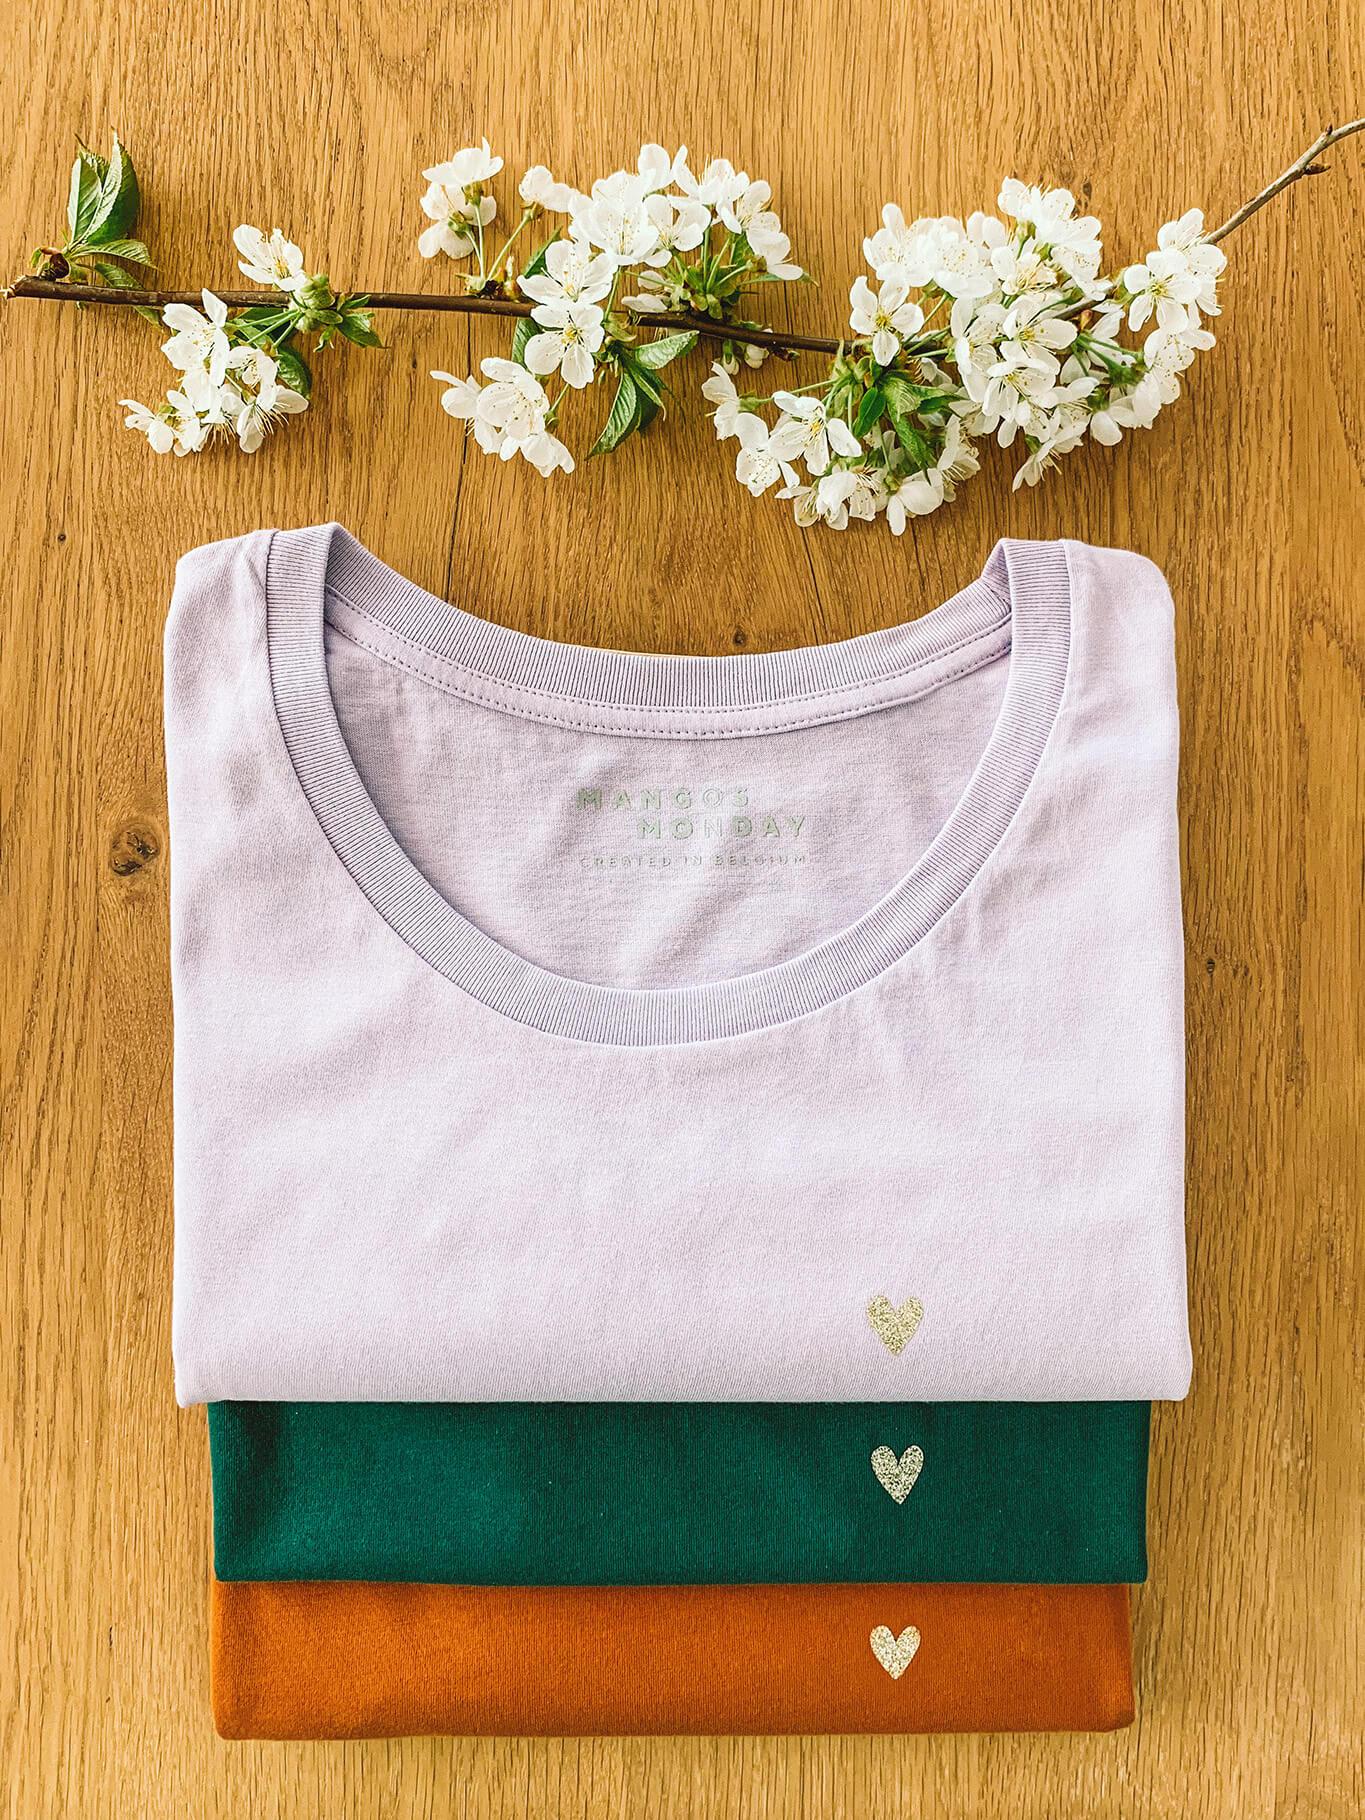 Love (heart) t-shirt by Mangos on Monday